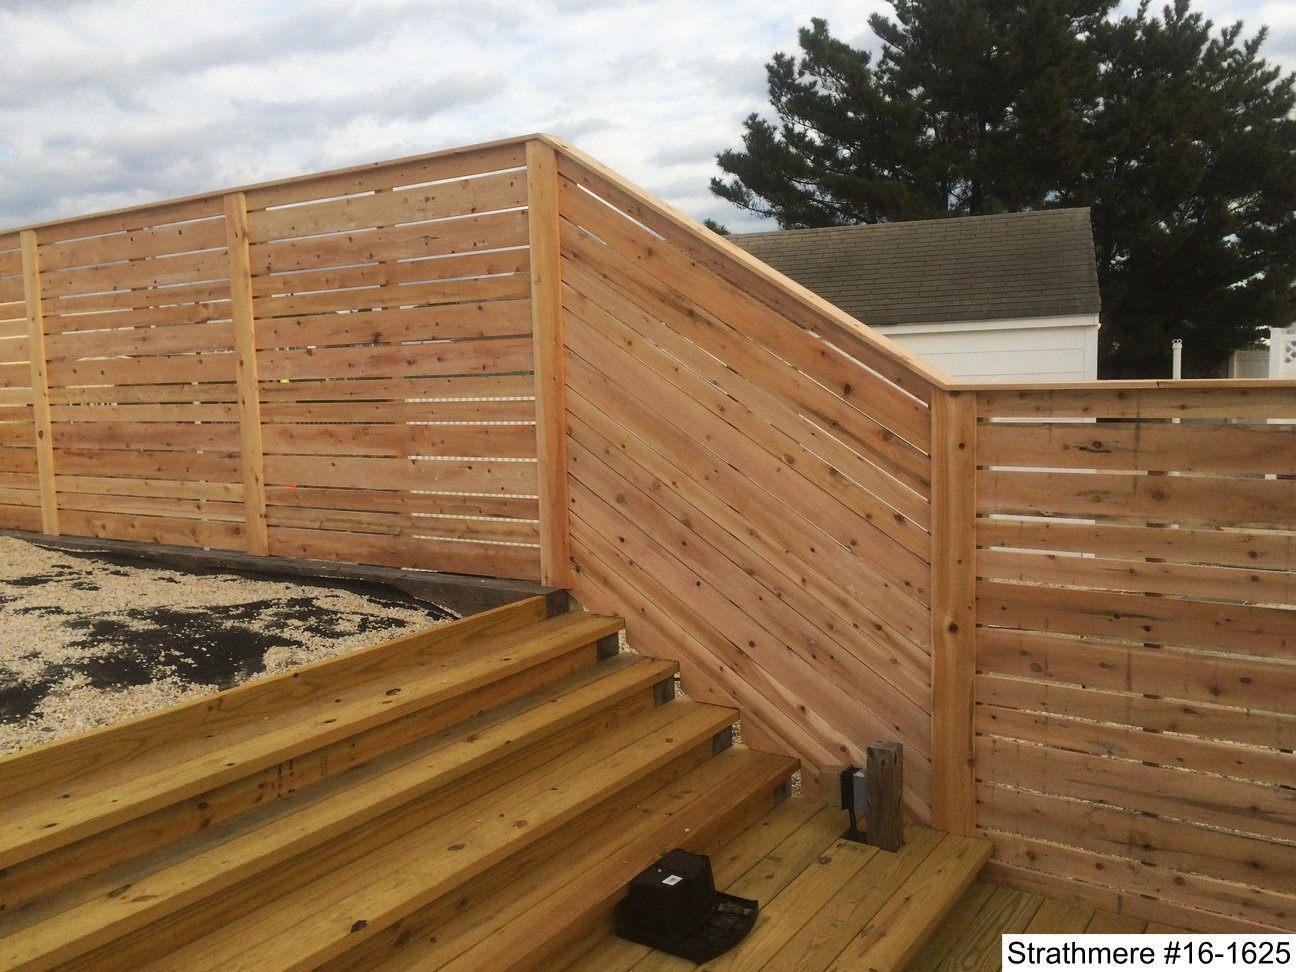 Horizontal wood fence horizontal wood privacy fence horizontal madera horizontal wood fence installed in strathmere nj baanklon Images